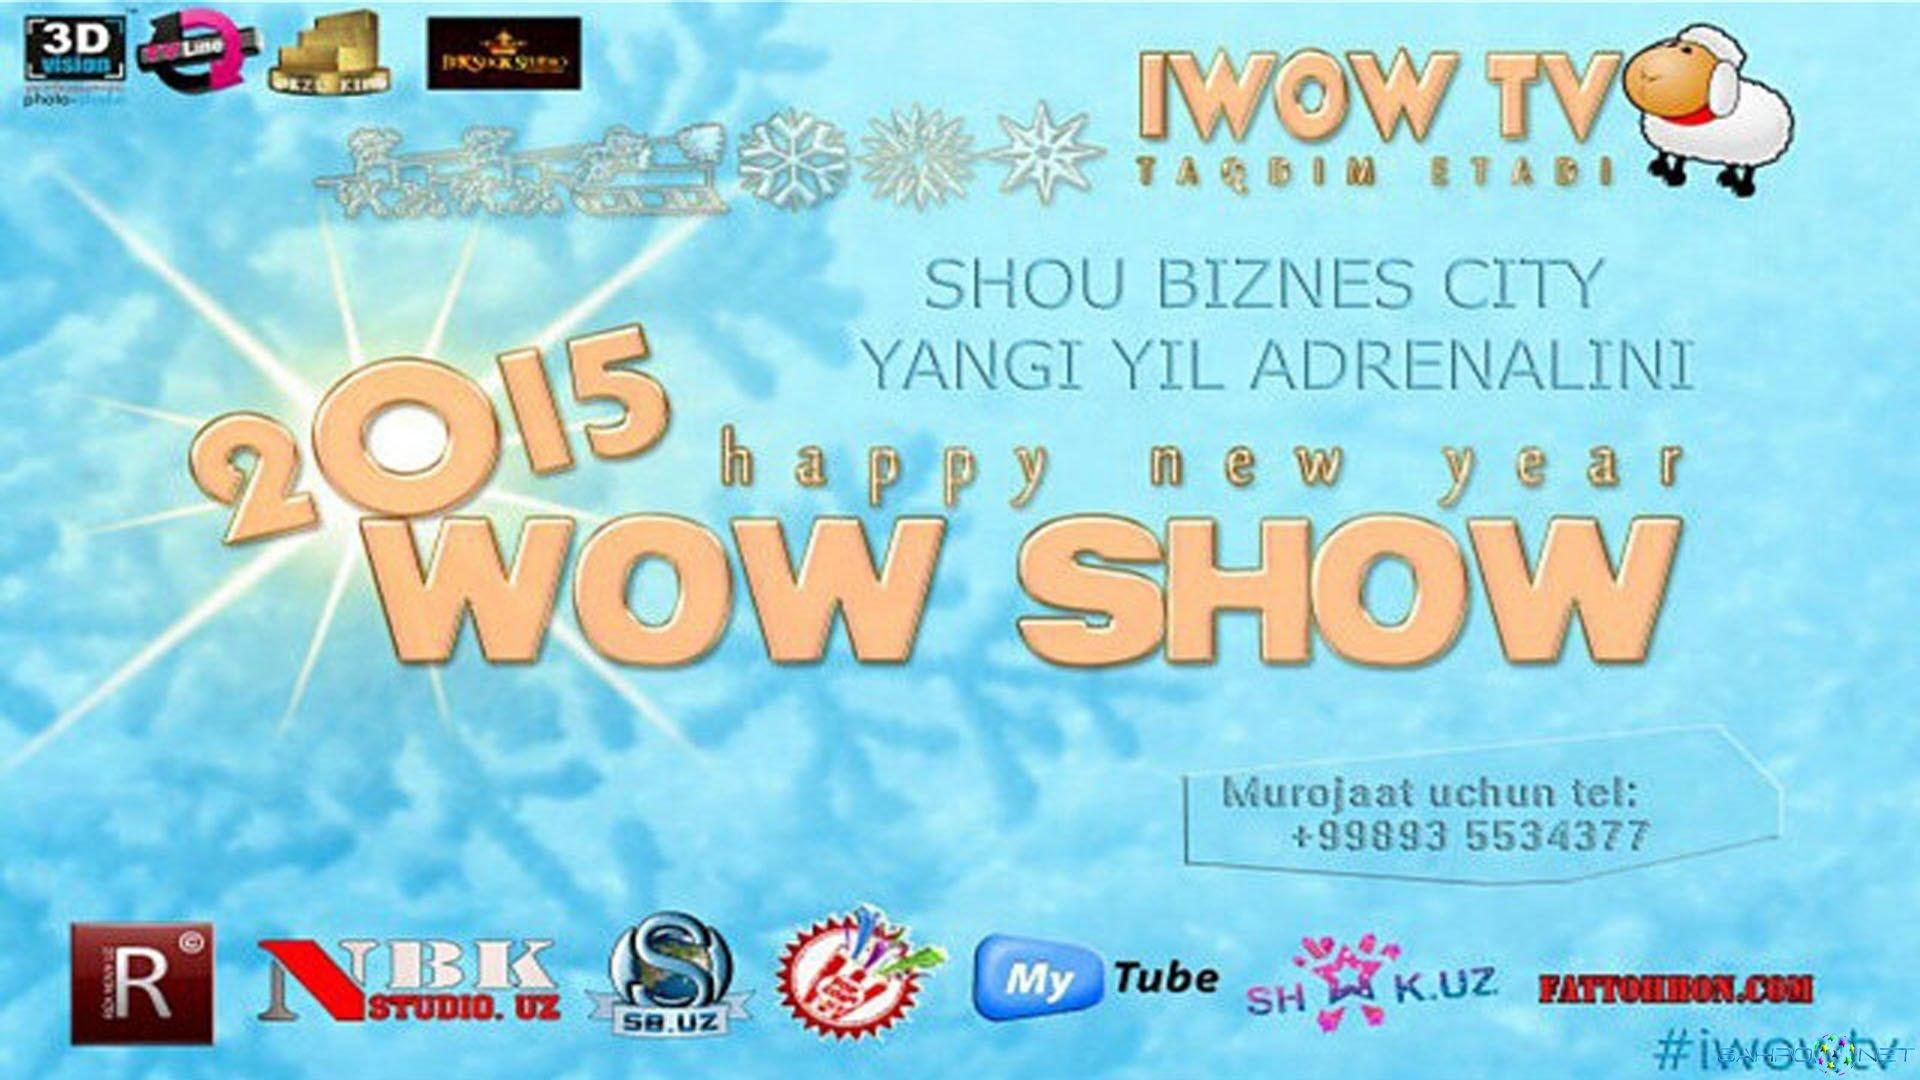 Wow Shou 2015 - iWOWTV Янги Йиллик Узб Шоу 2015